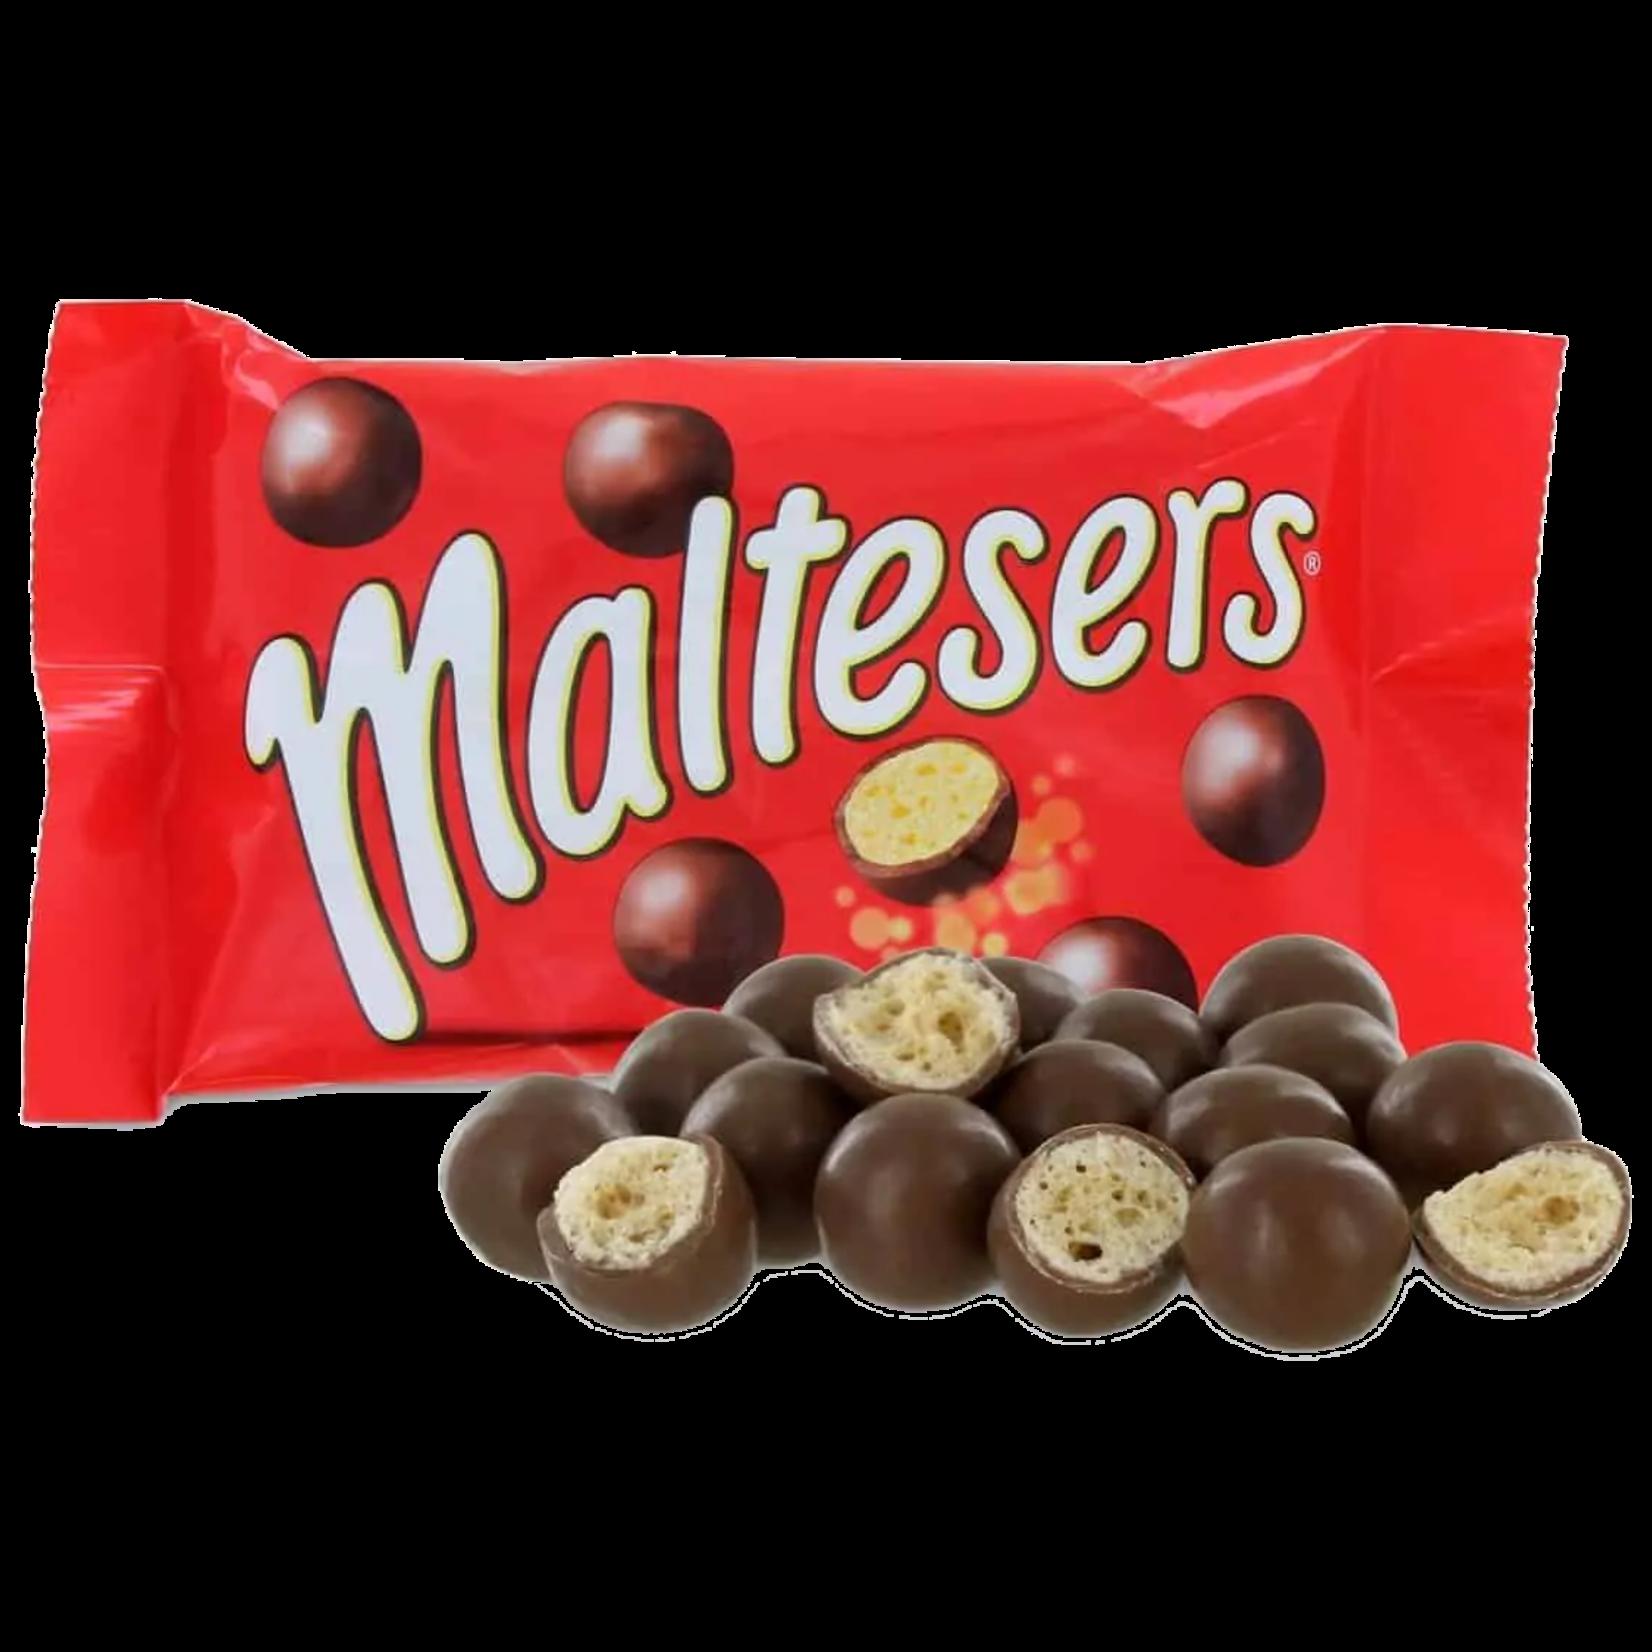 Malteasers Small Bag, 37g